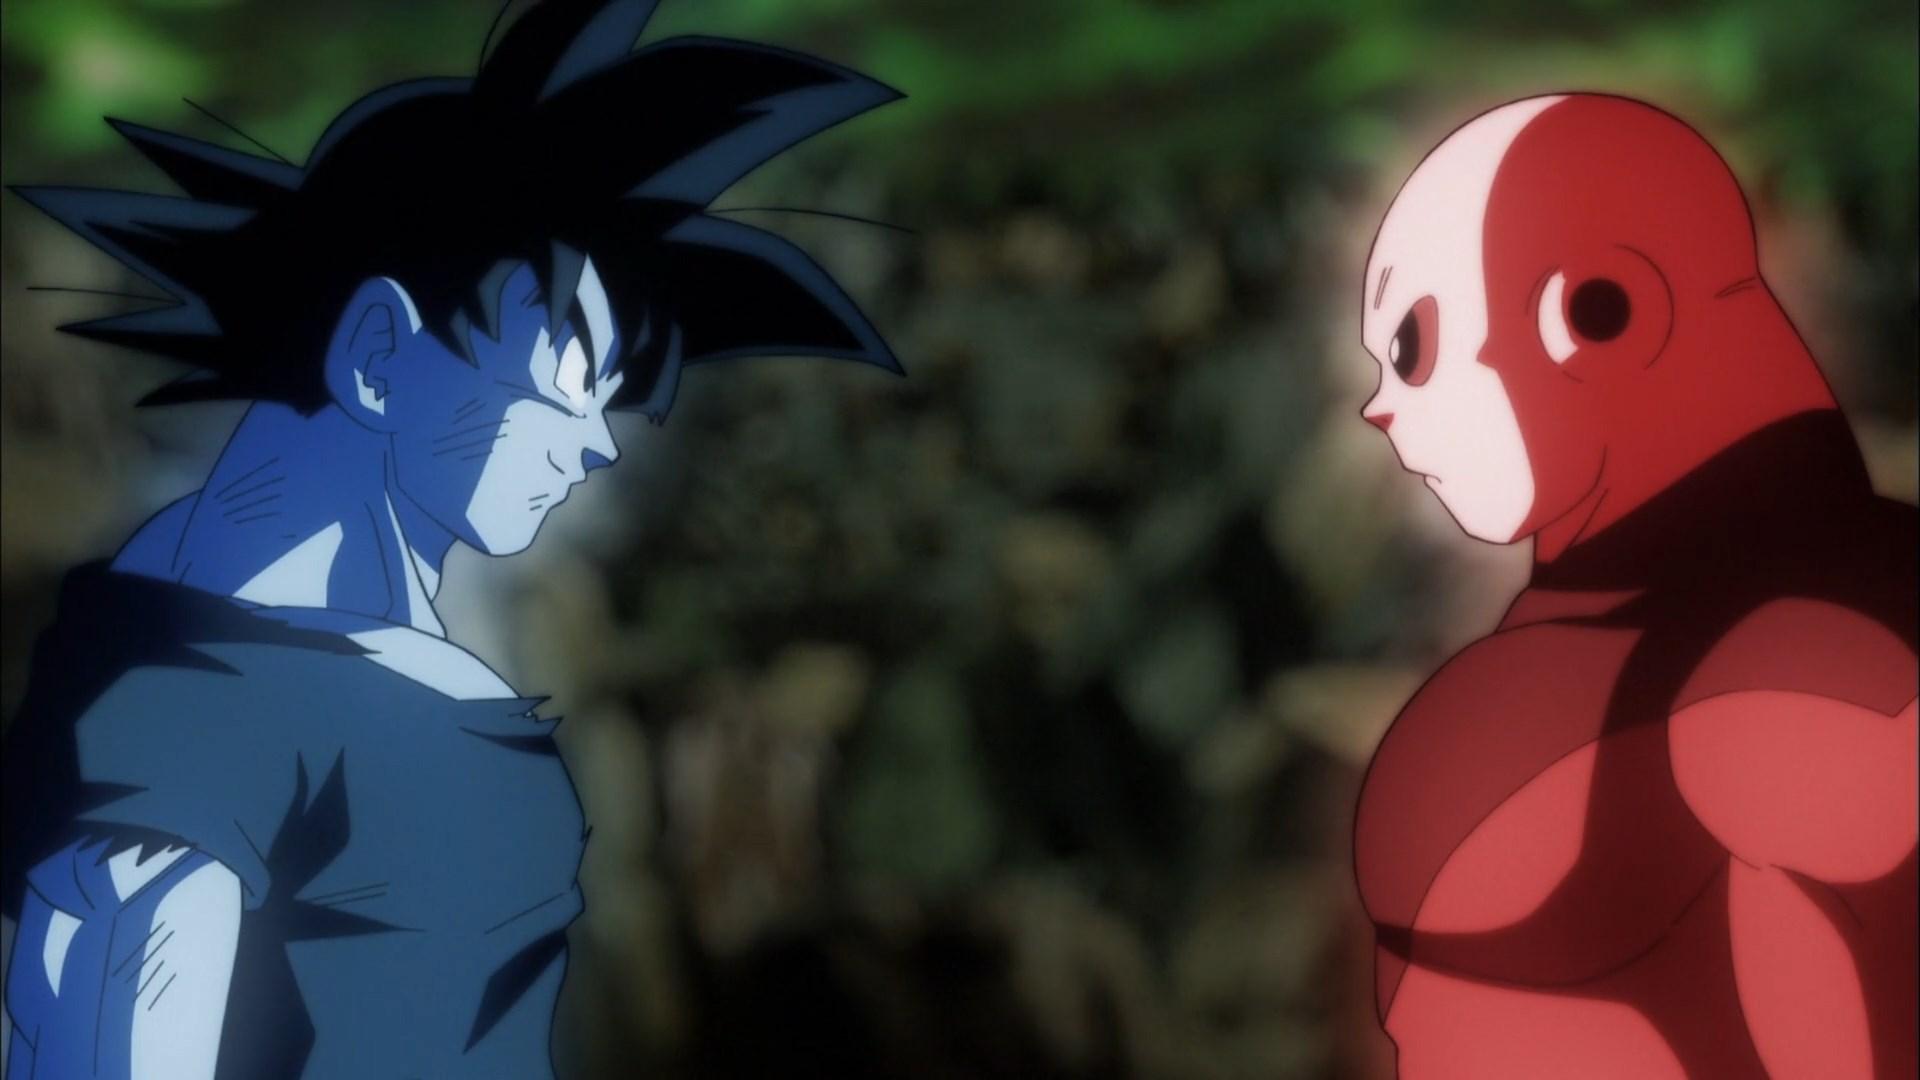 [HorribleSubs] Dragon Ball Super - 121 [1080p].mkv_snapshot_21.56